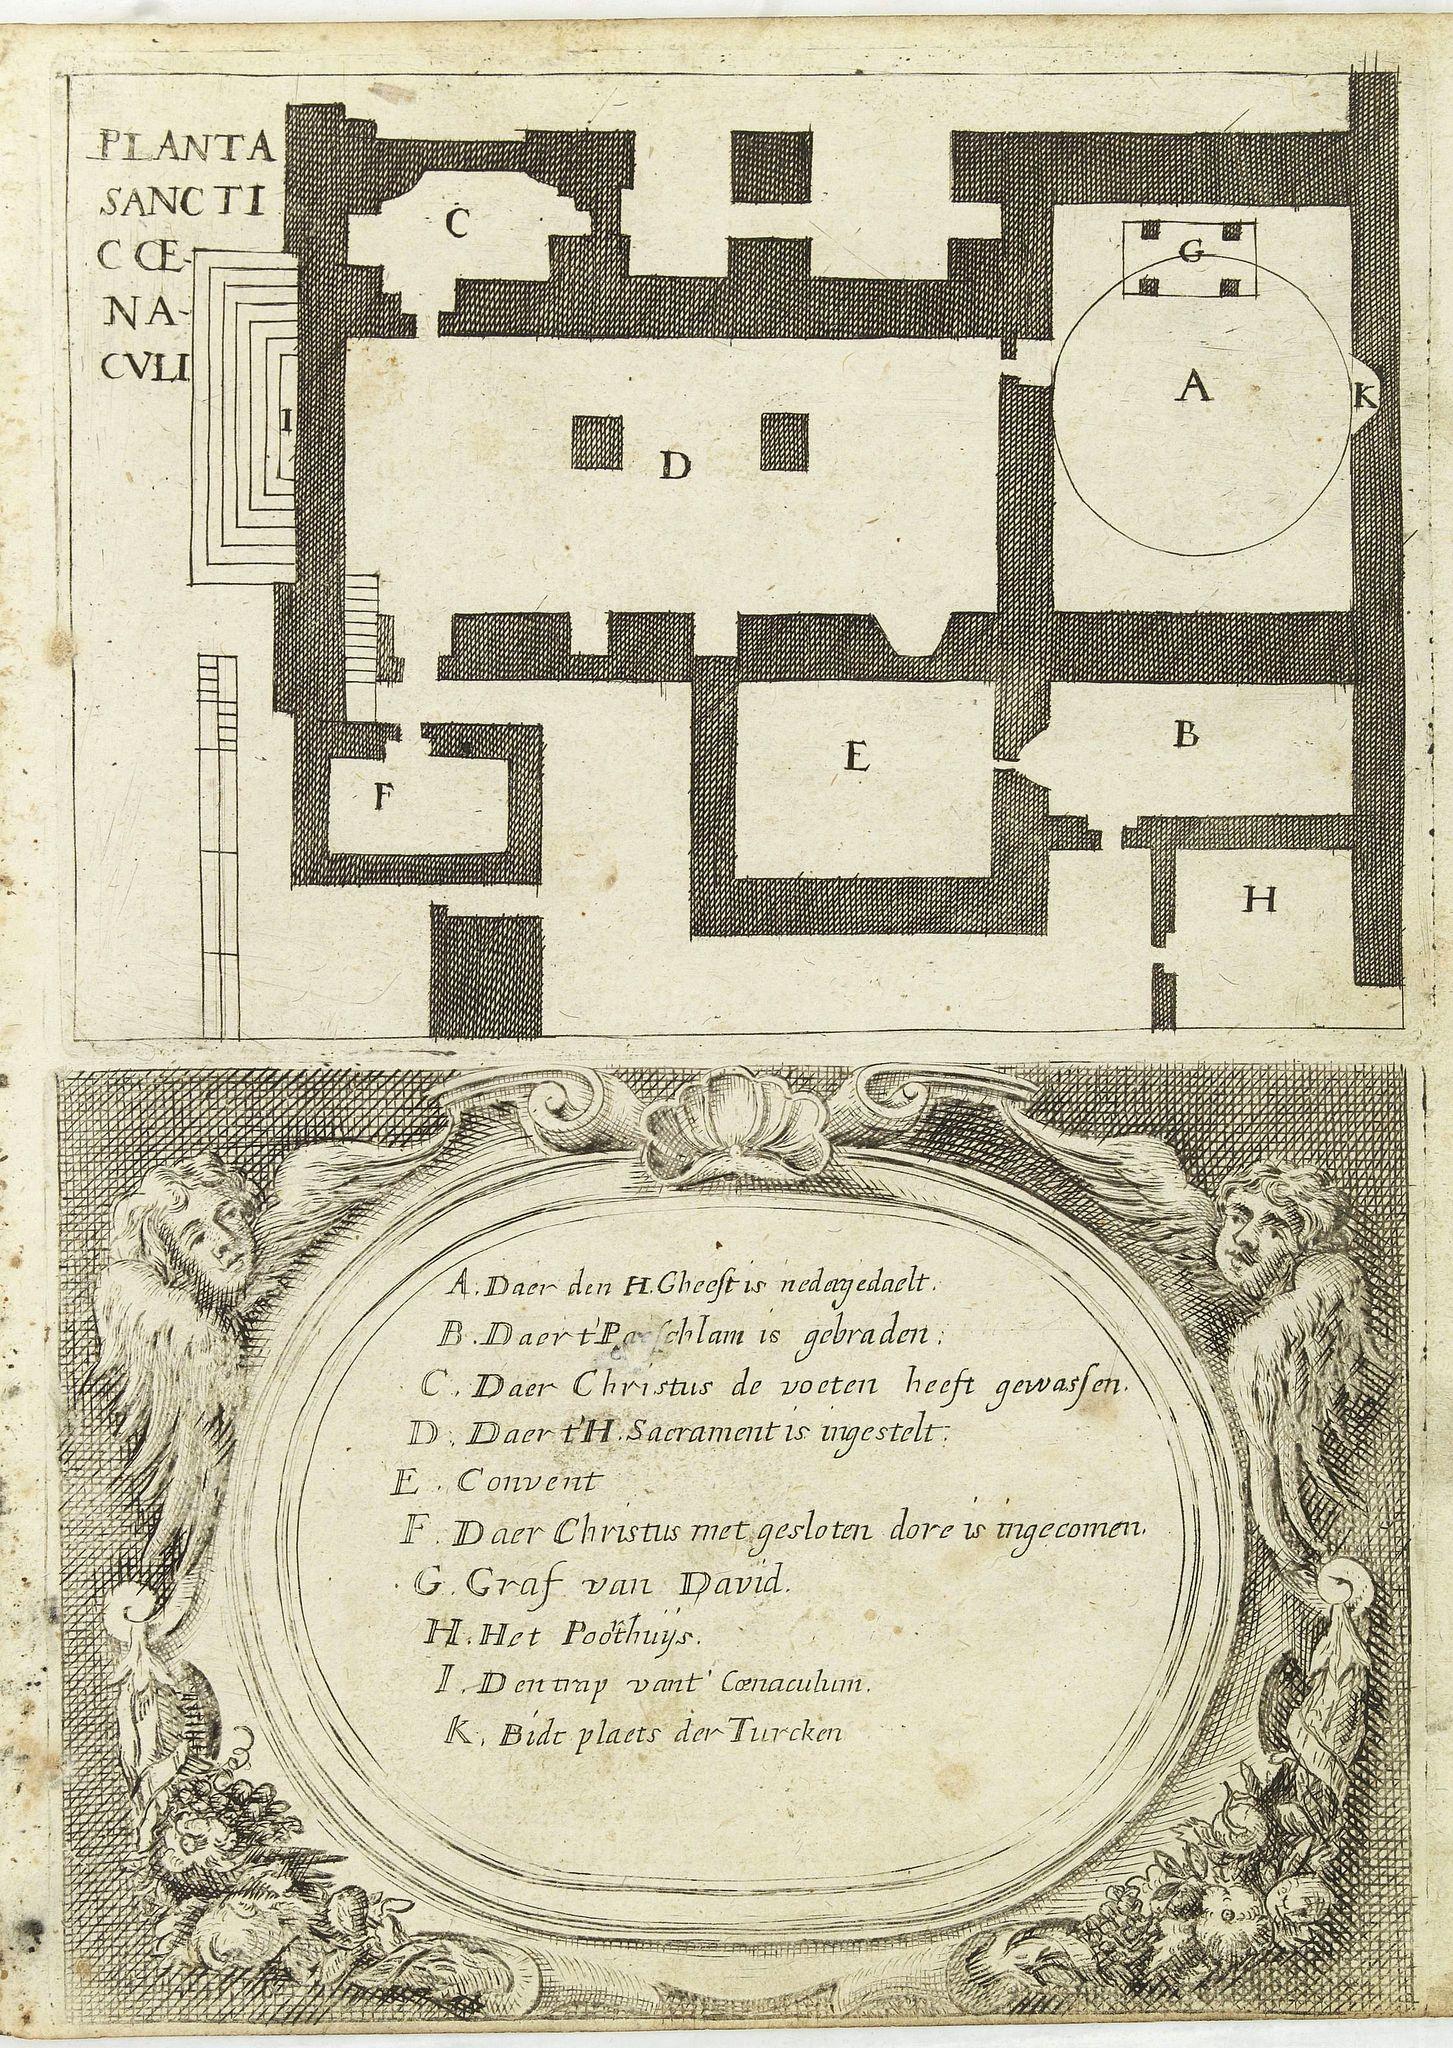 GONSALES, A -  [Illustration from Hierusalemsche Reyse.] Planta sancticce naculi.